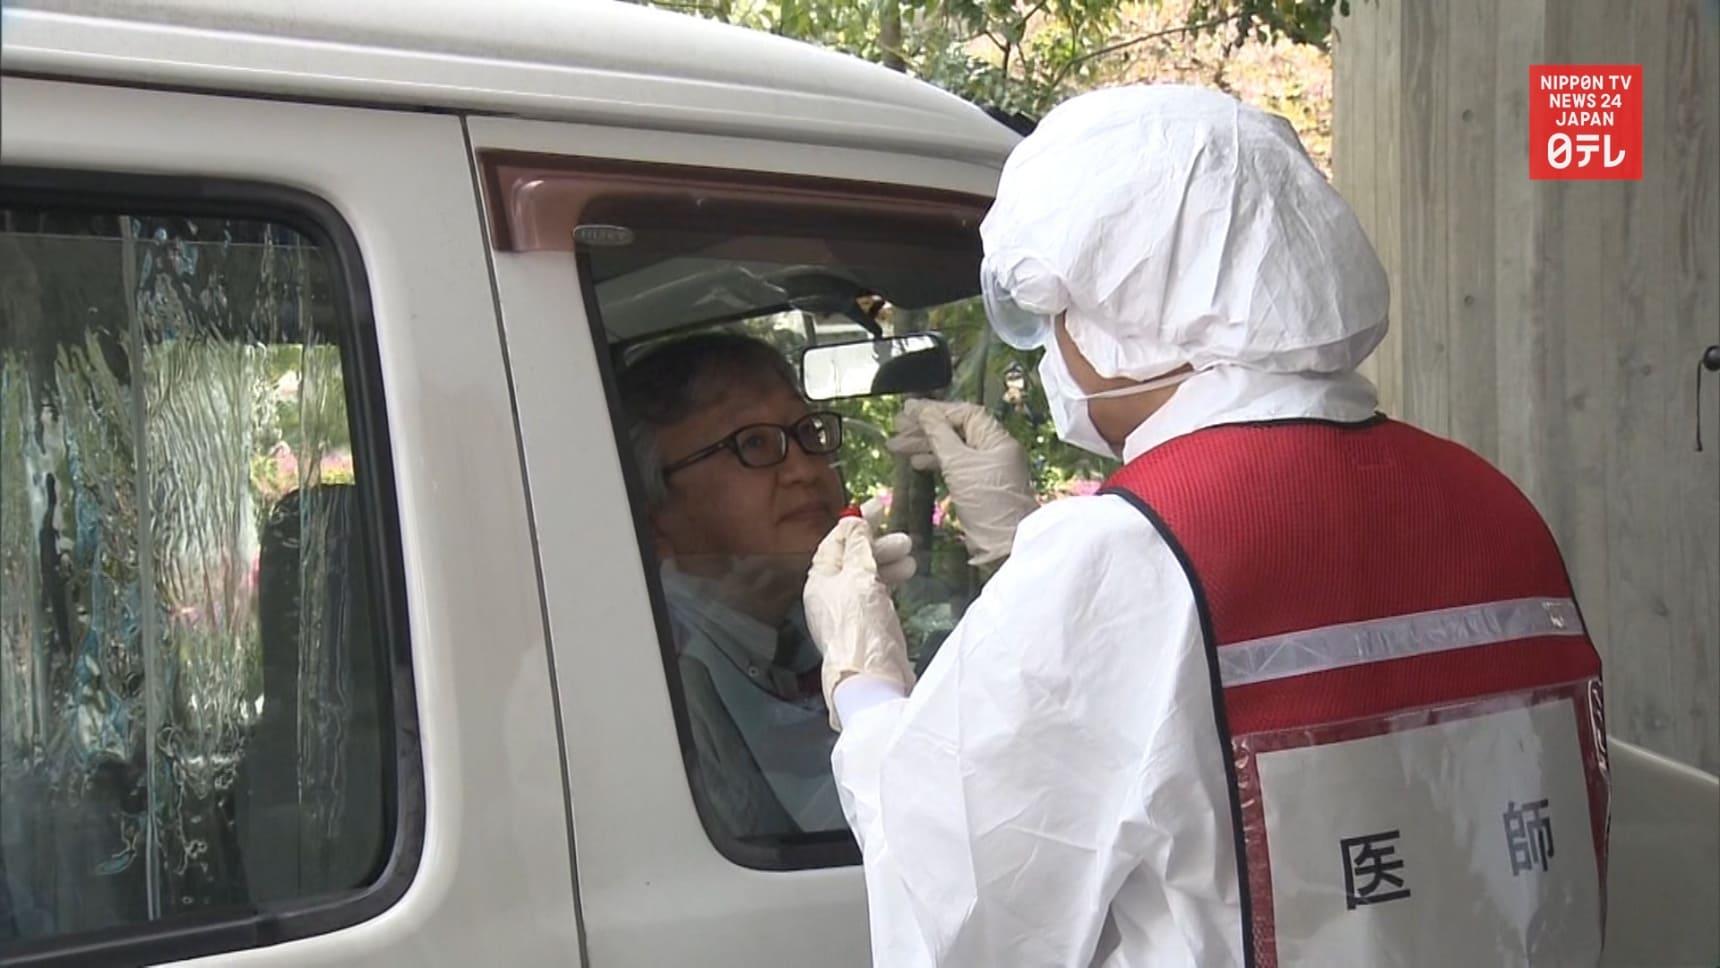 Tokyo Ward Begins Drive-Through COVID Testing